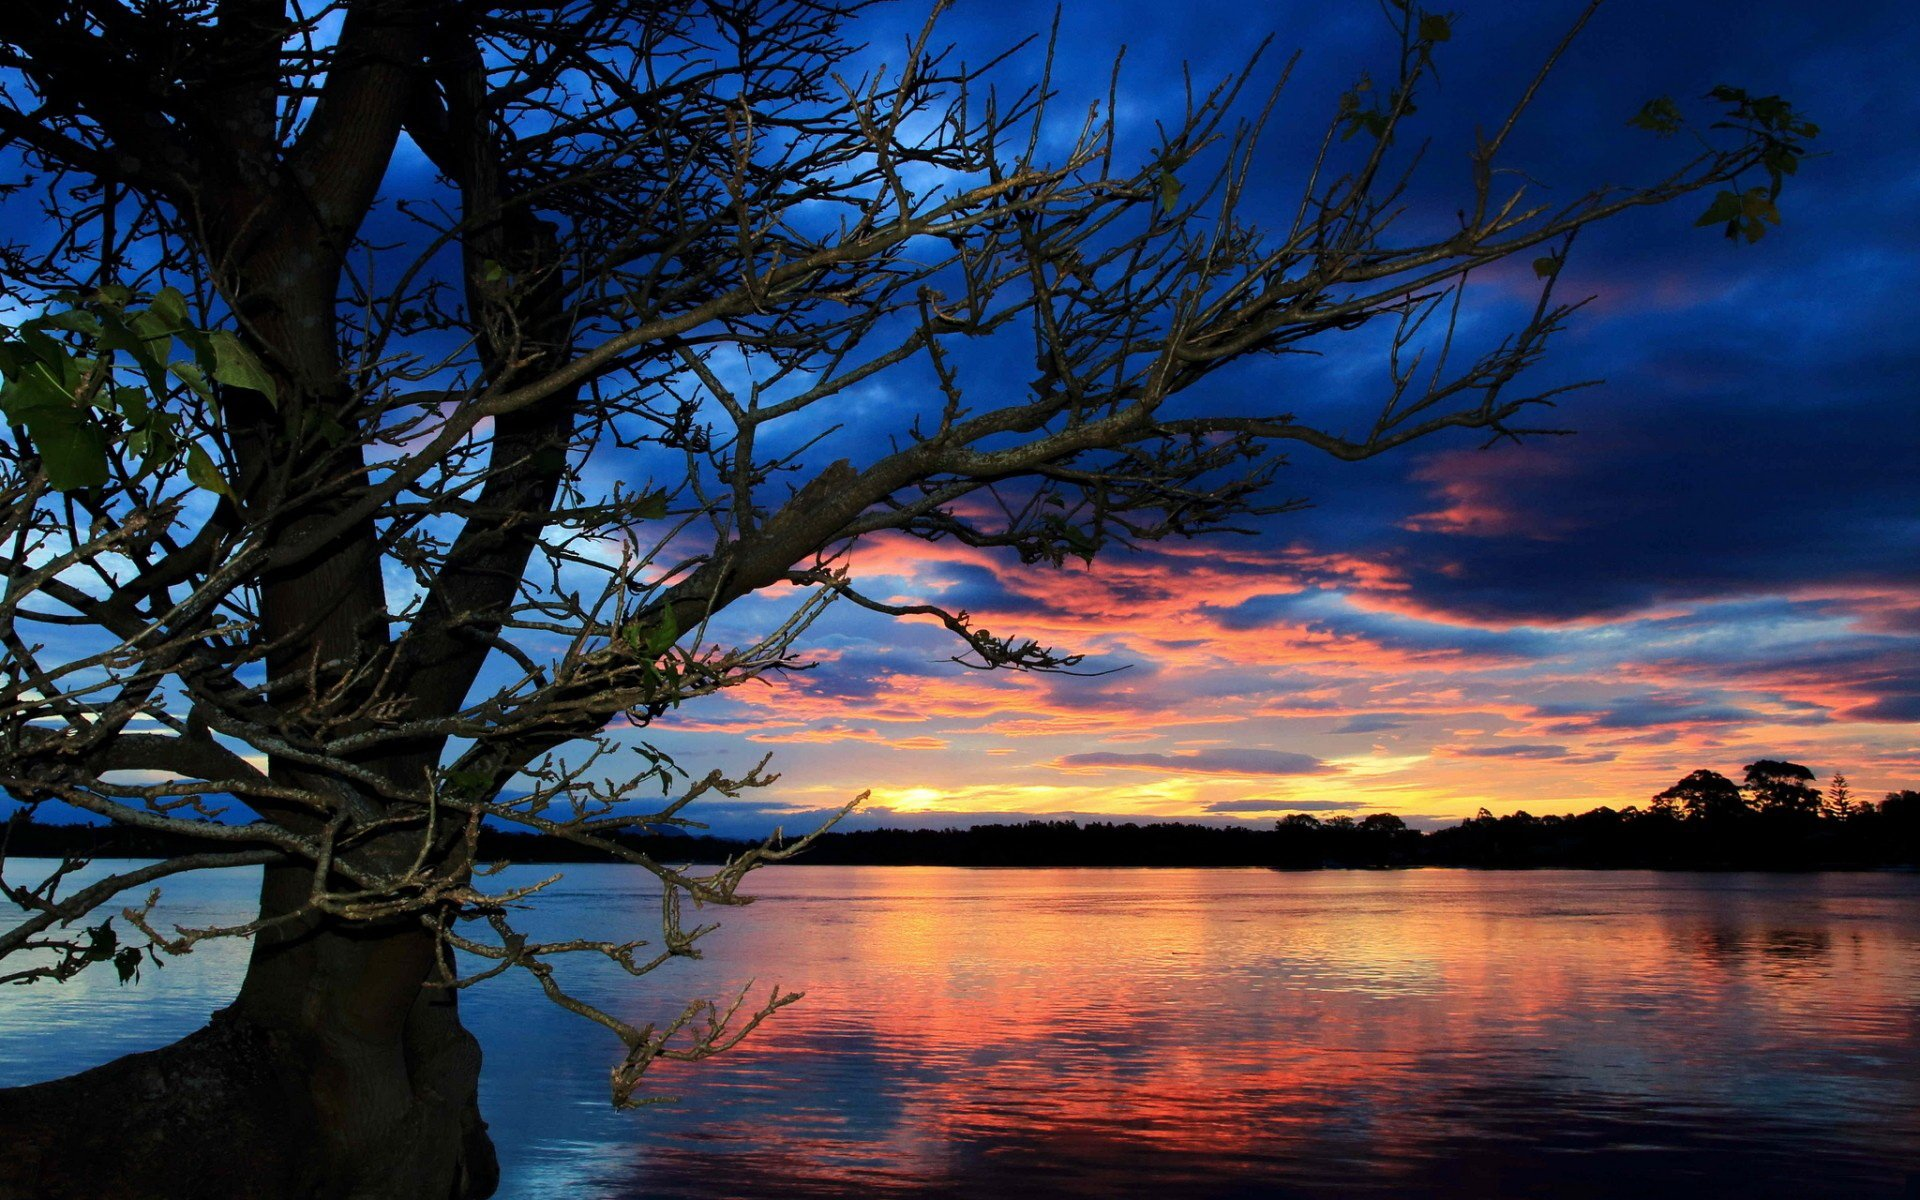 Sunset HD Wallpaper  Background Image  1920x1200  ID